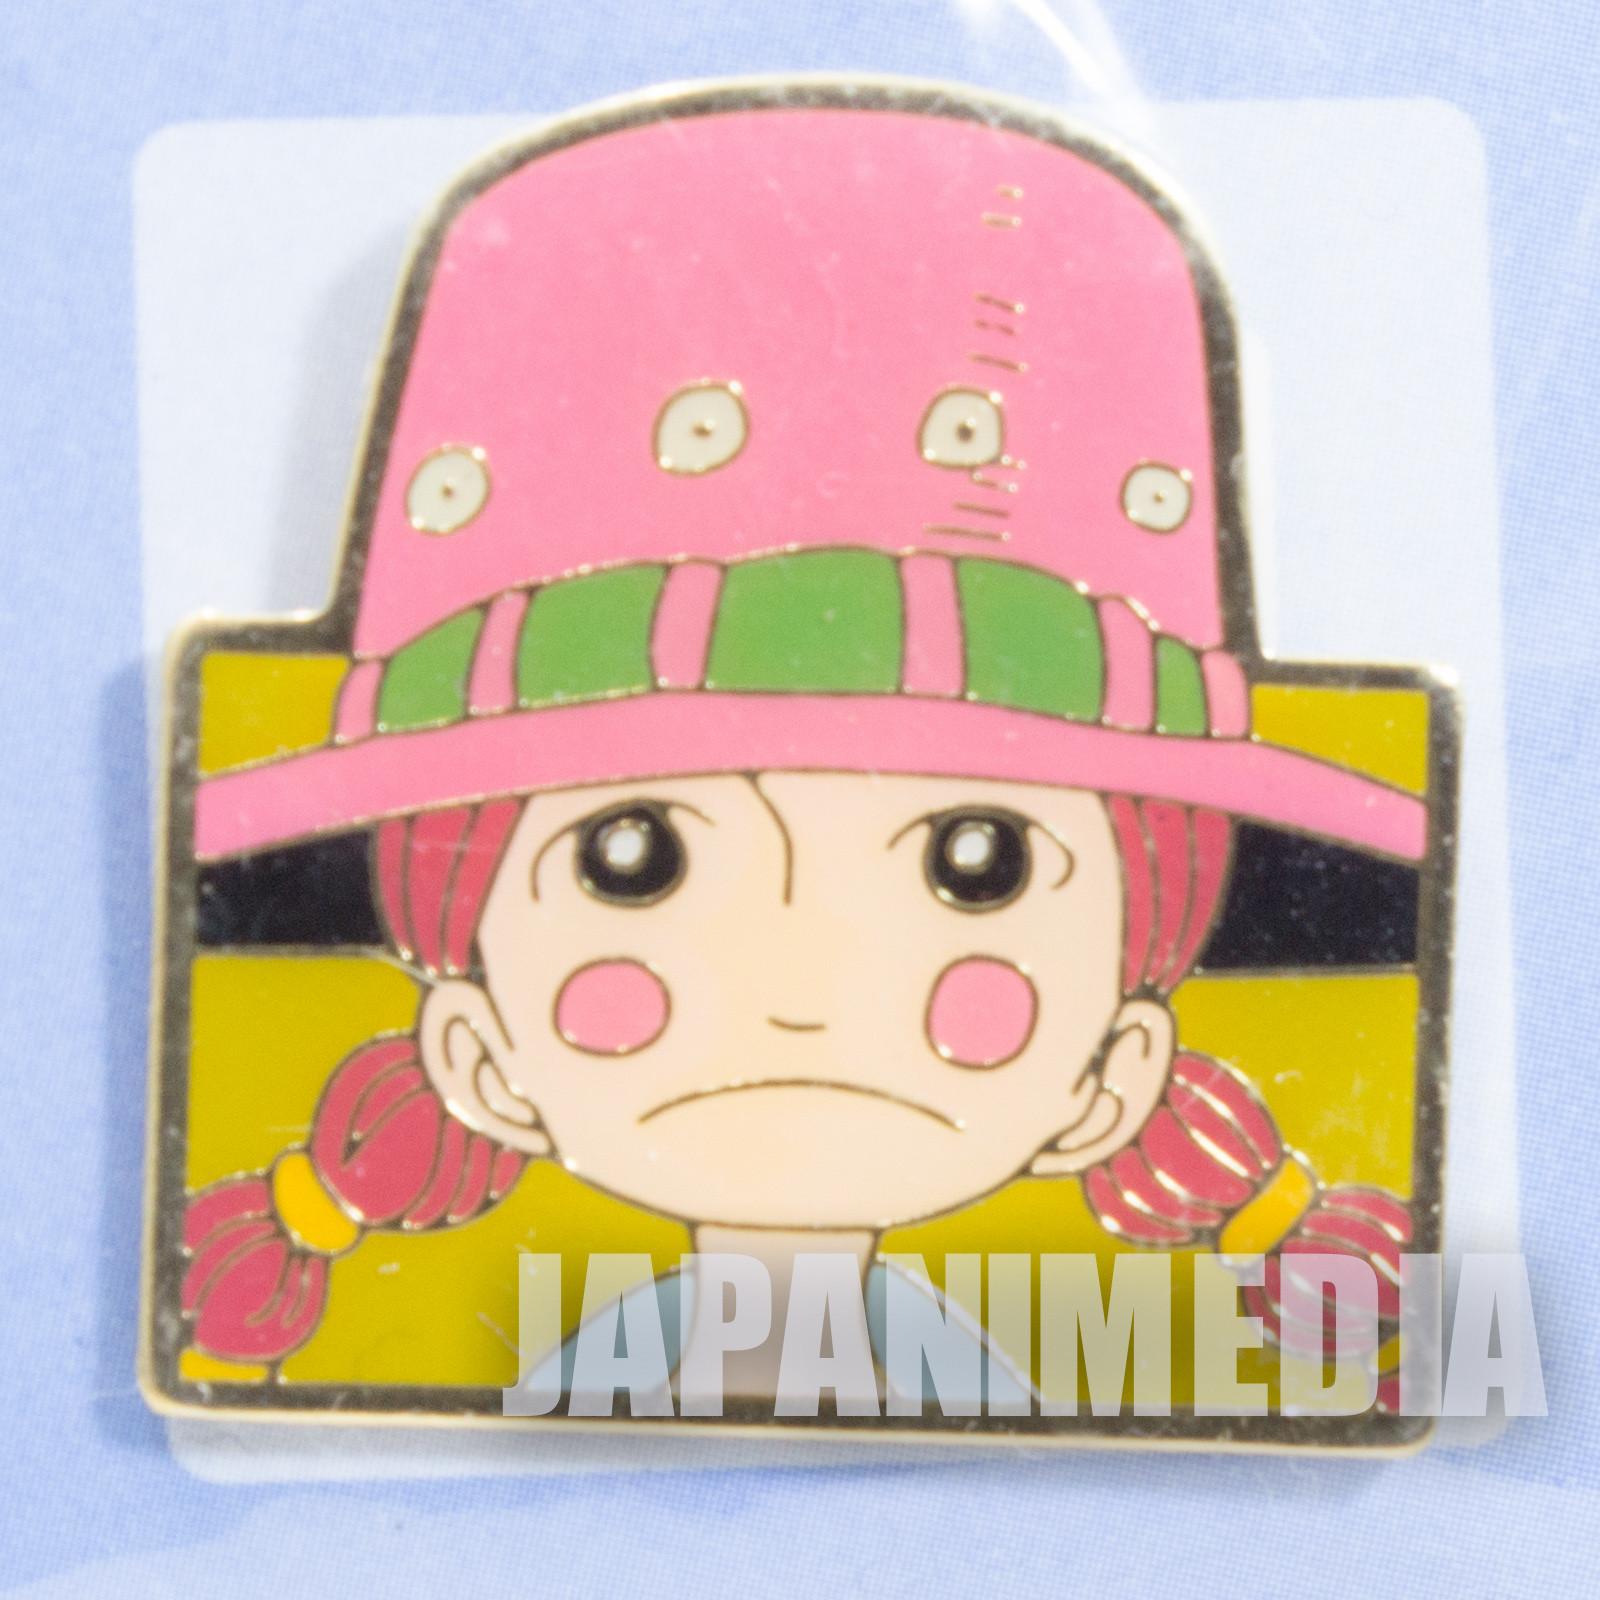 ONE PIECE Miss Goldenweek (Marianne) Weekly Jump Character Pins JAPAN ANIME MANGA